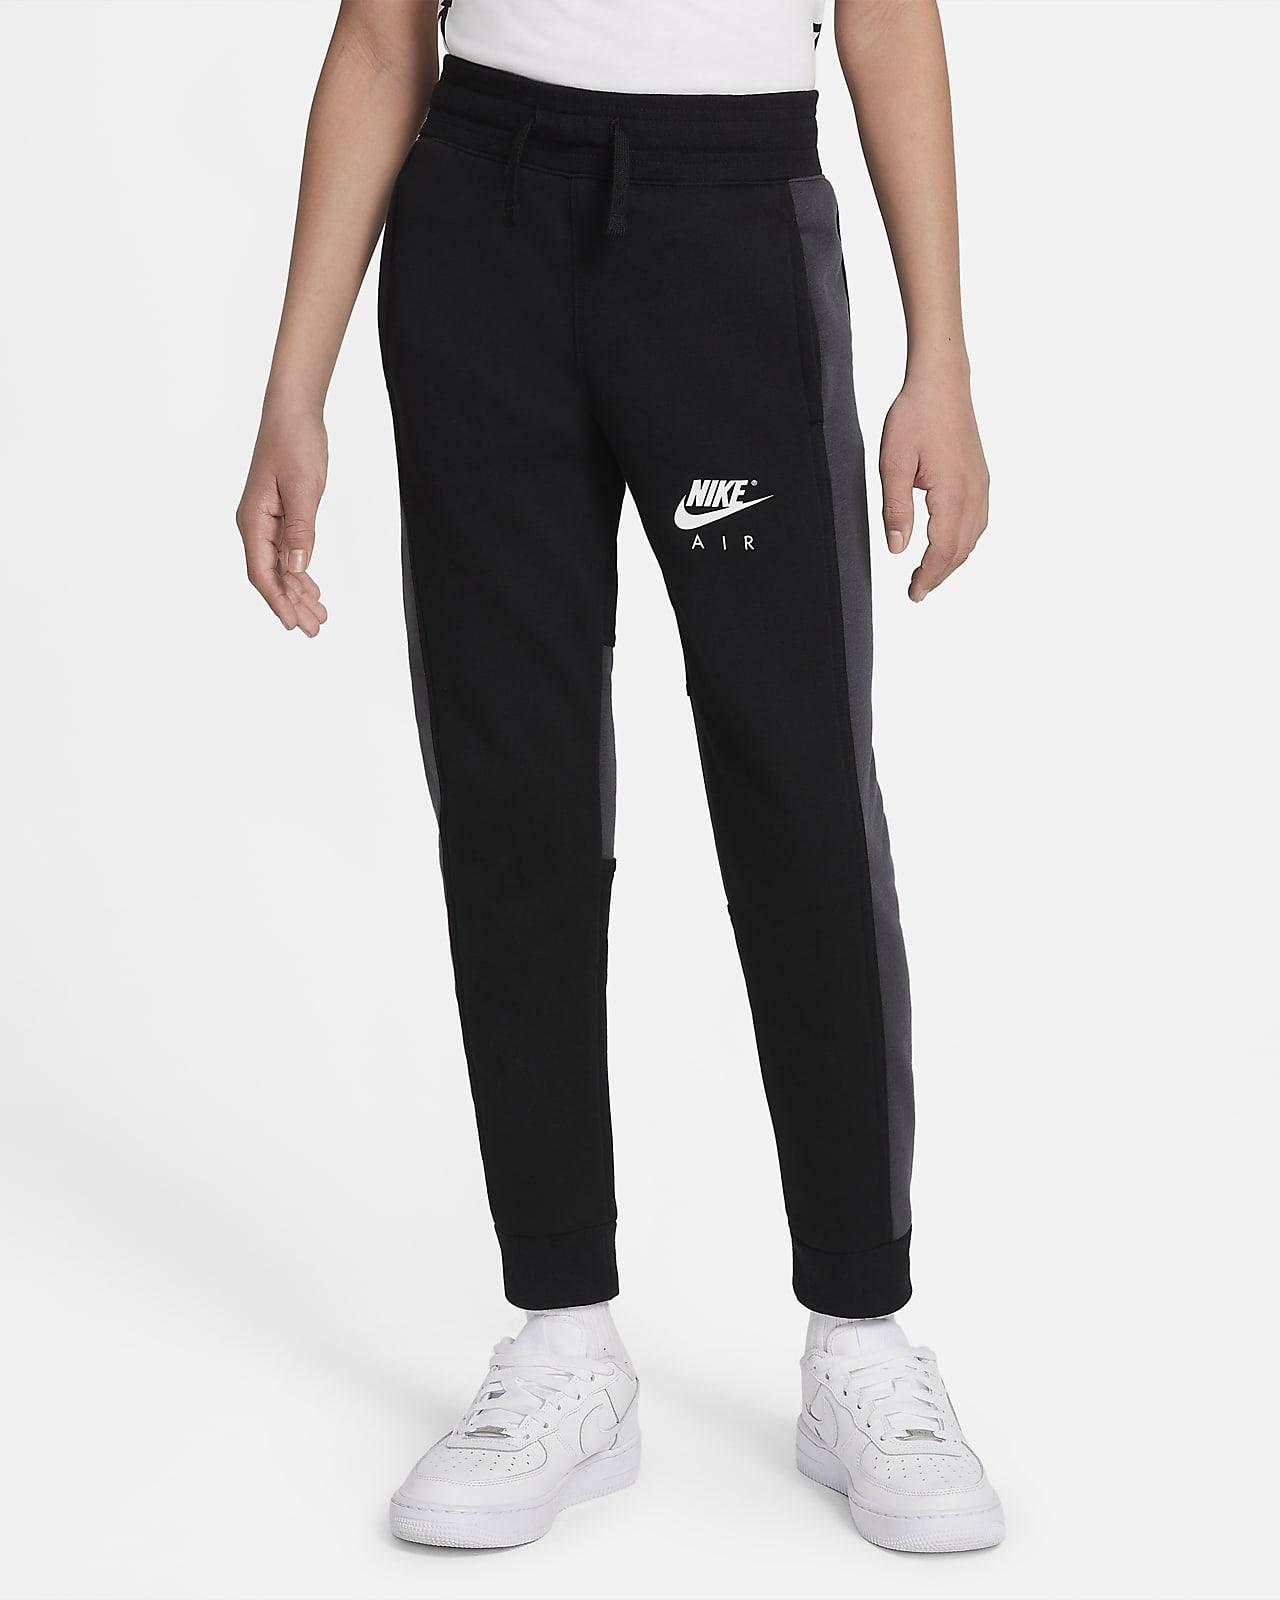 Nike Air Genç Çocuk (Erkek) Eşofman Altı